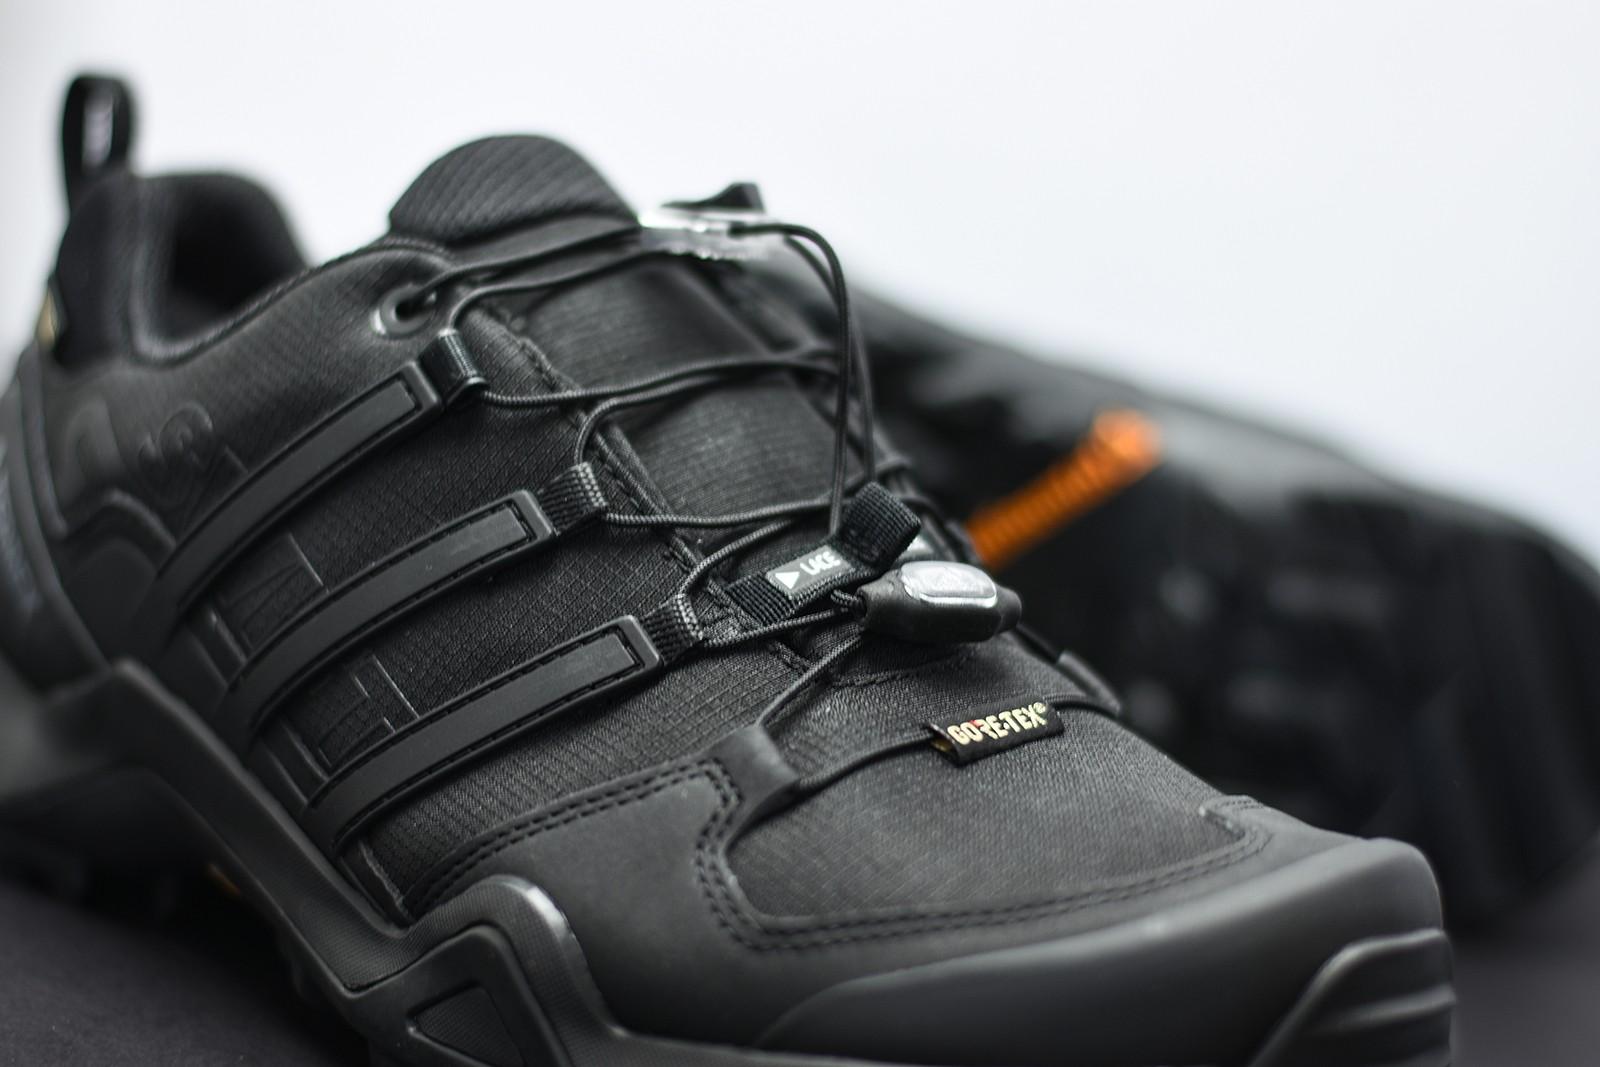 Pánská treková obuv adidas Performance TERREX SWIFT R2 GTX  87d211a3acf